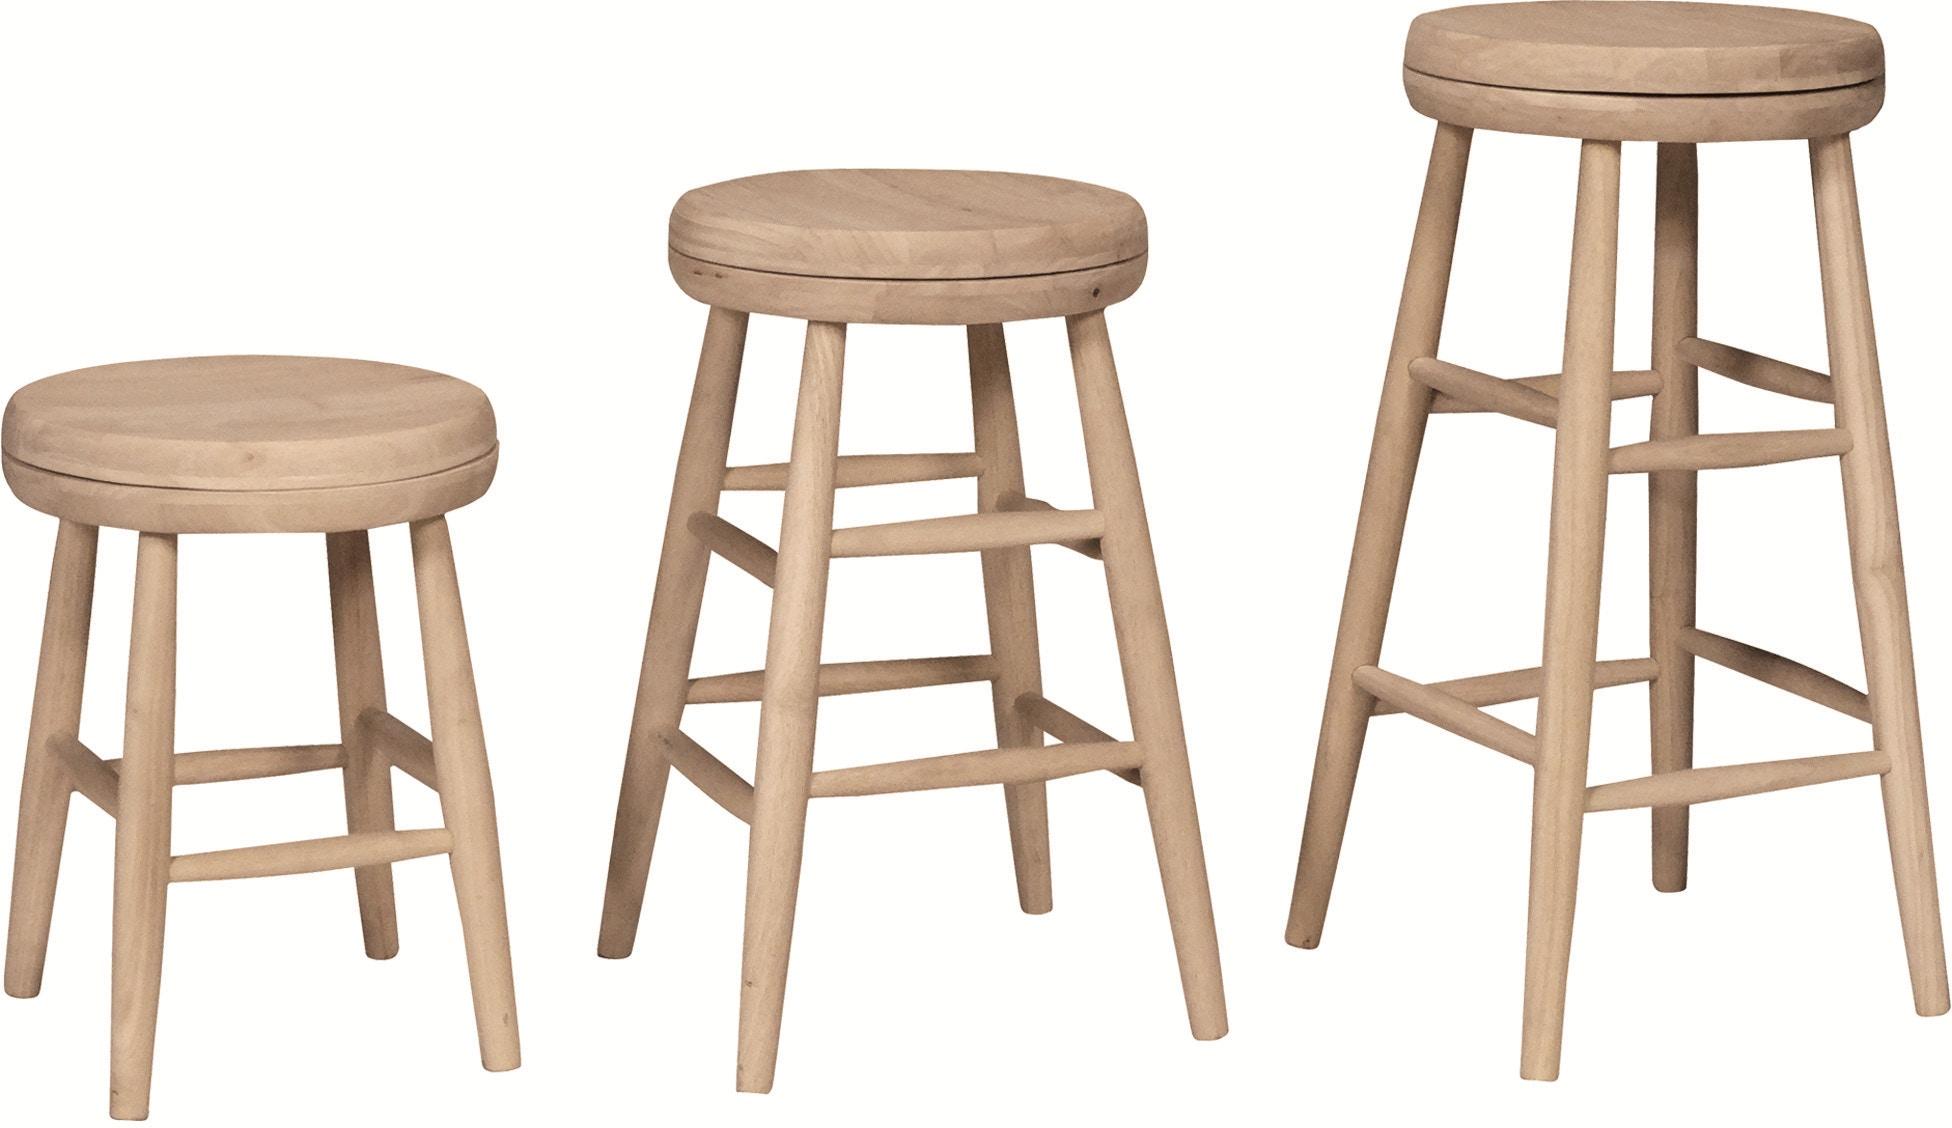 John Thomas Bar And Game Room Scoop Seat Swivel Stools S